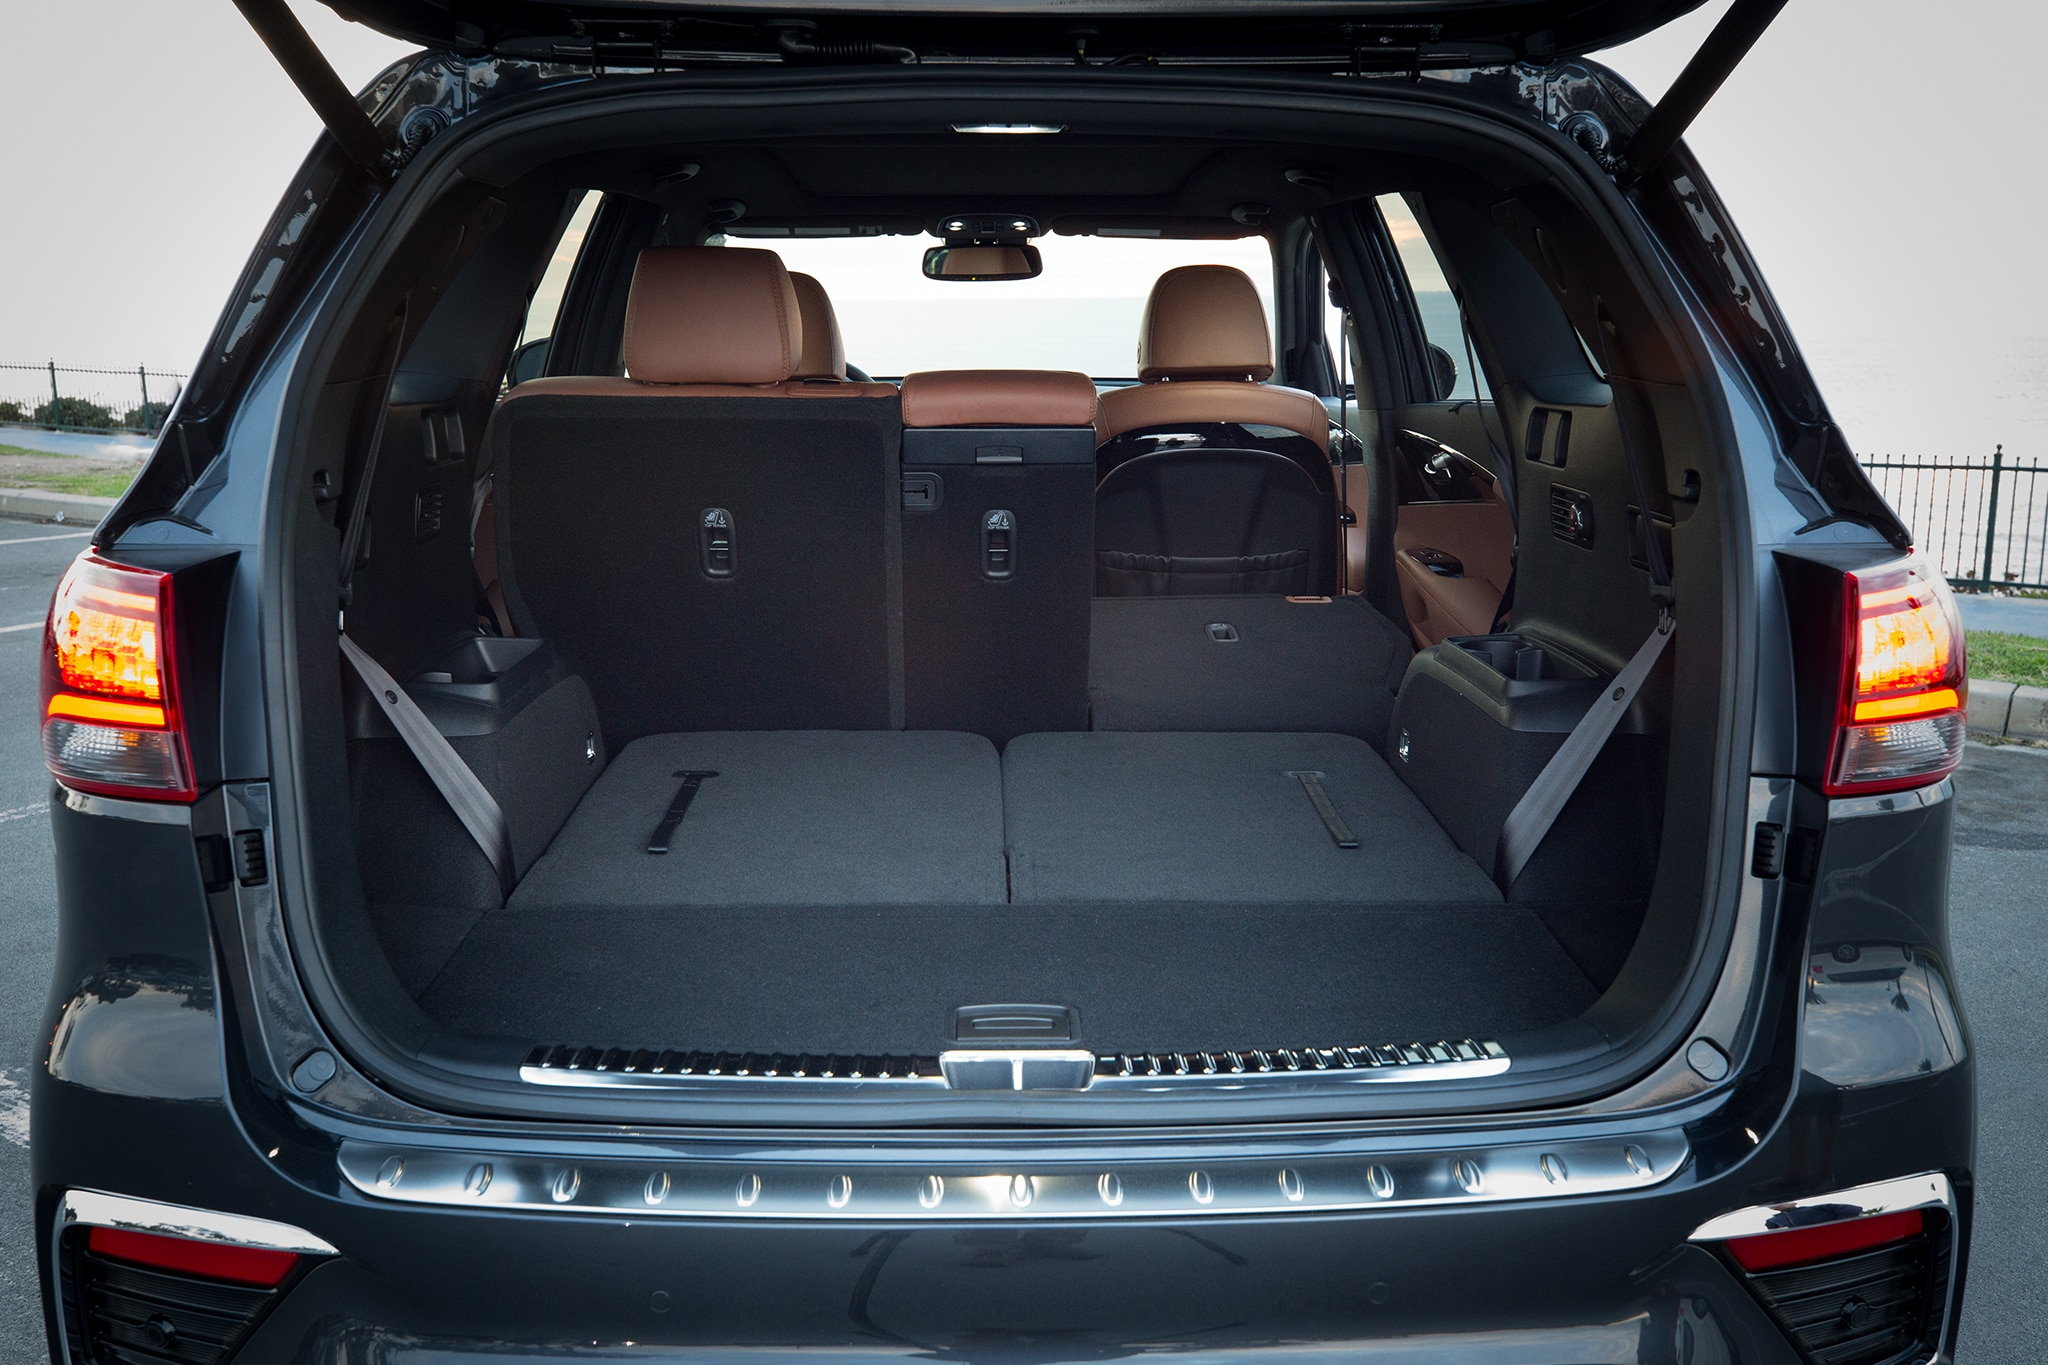 2017 Mazda3 Hatchback Configurations >> 2019 Kia Sorento Gets an Updated Powertrain Lineup